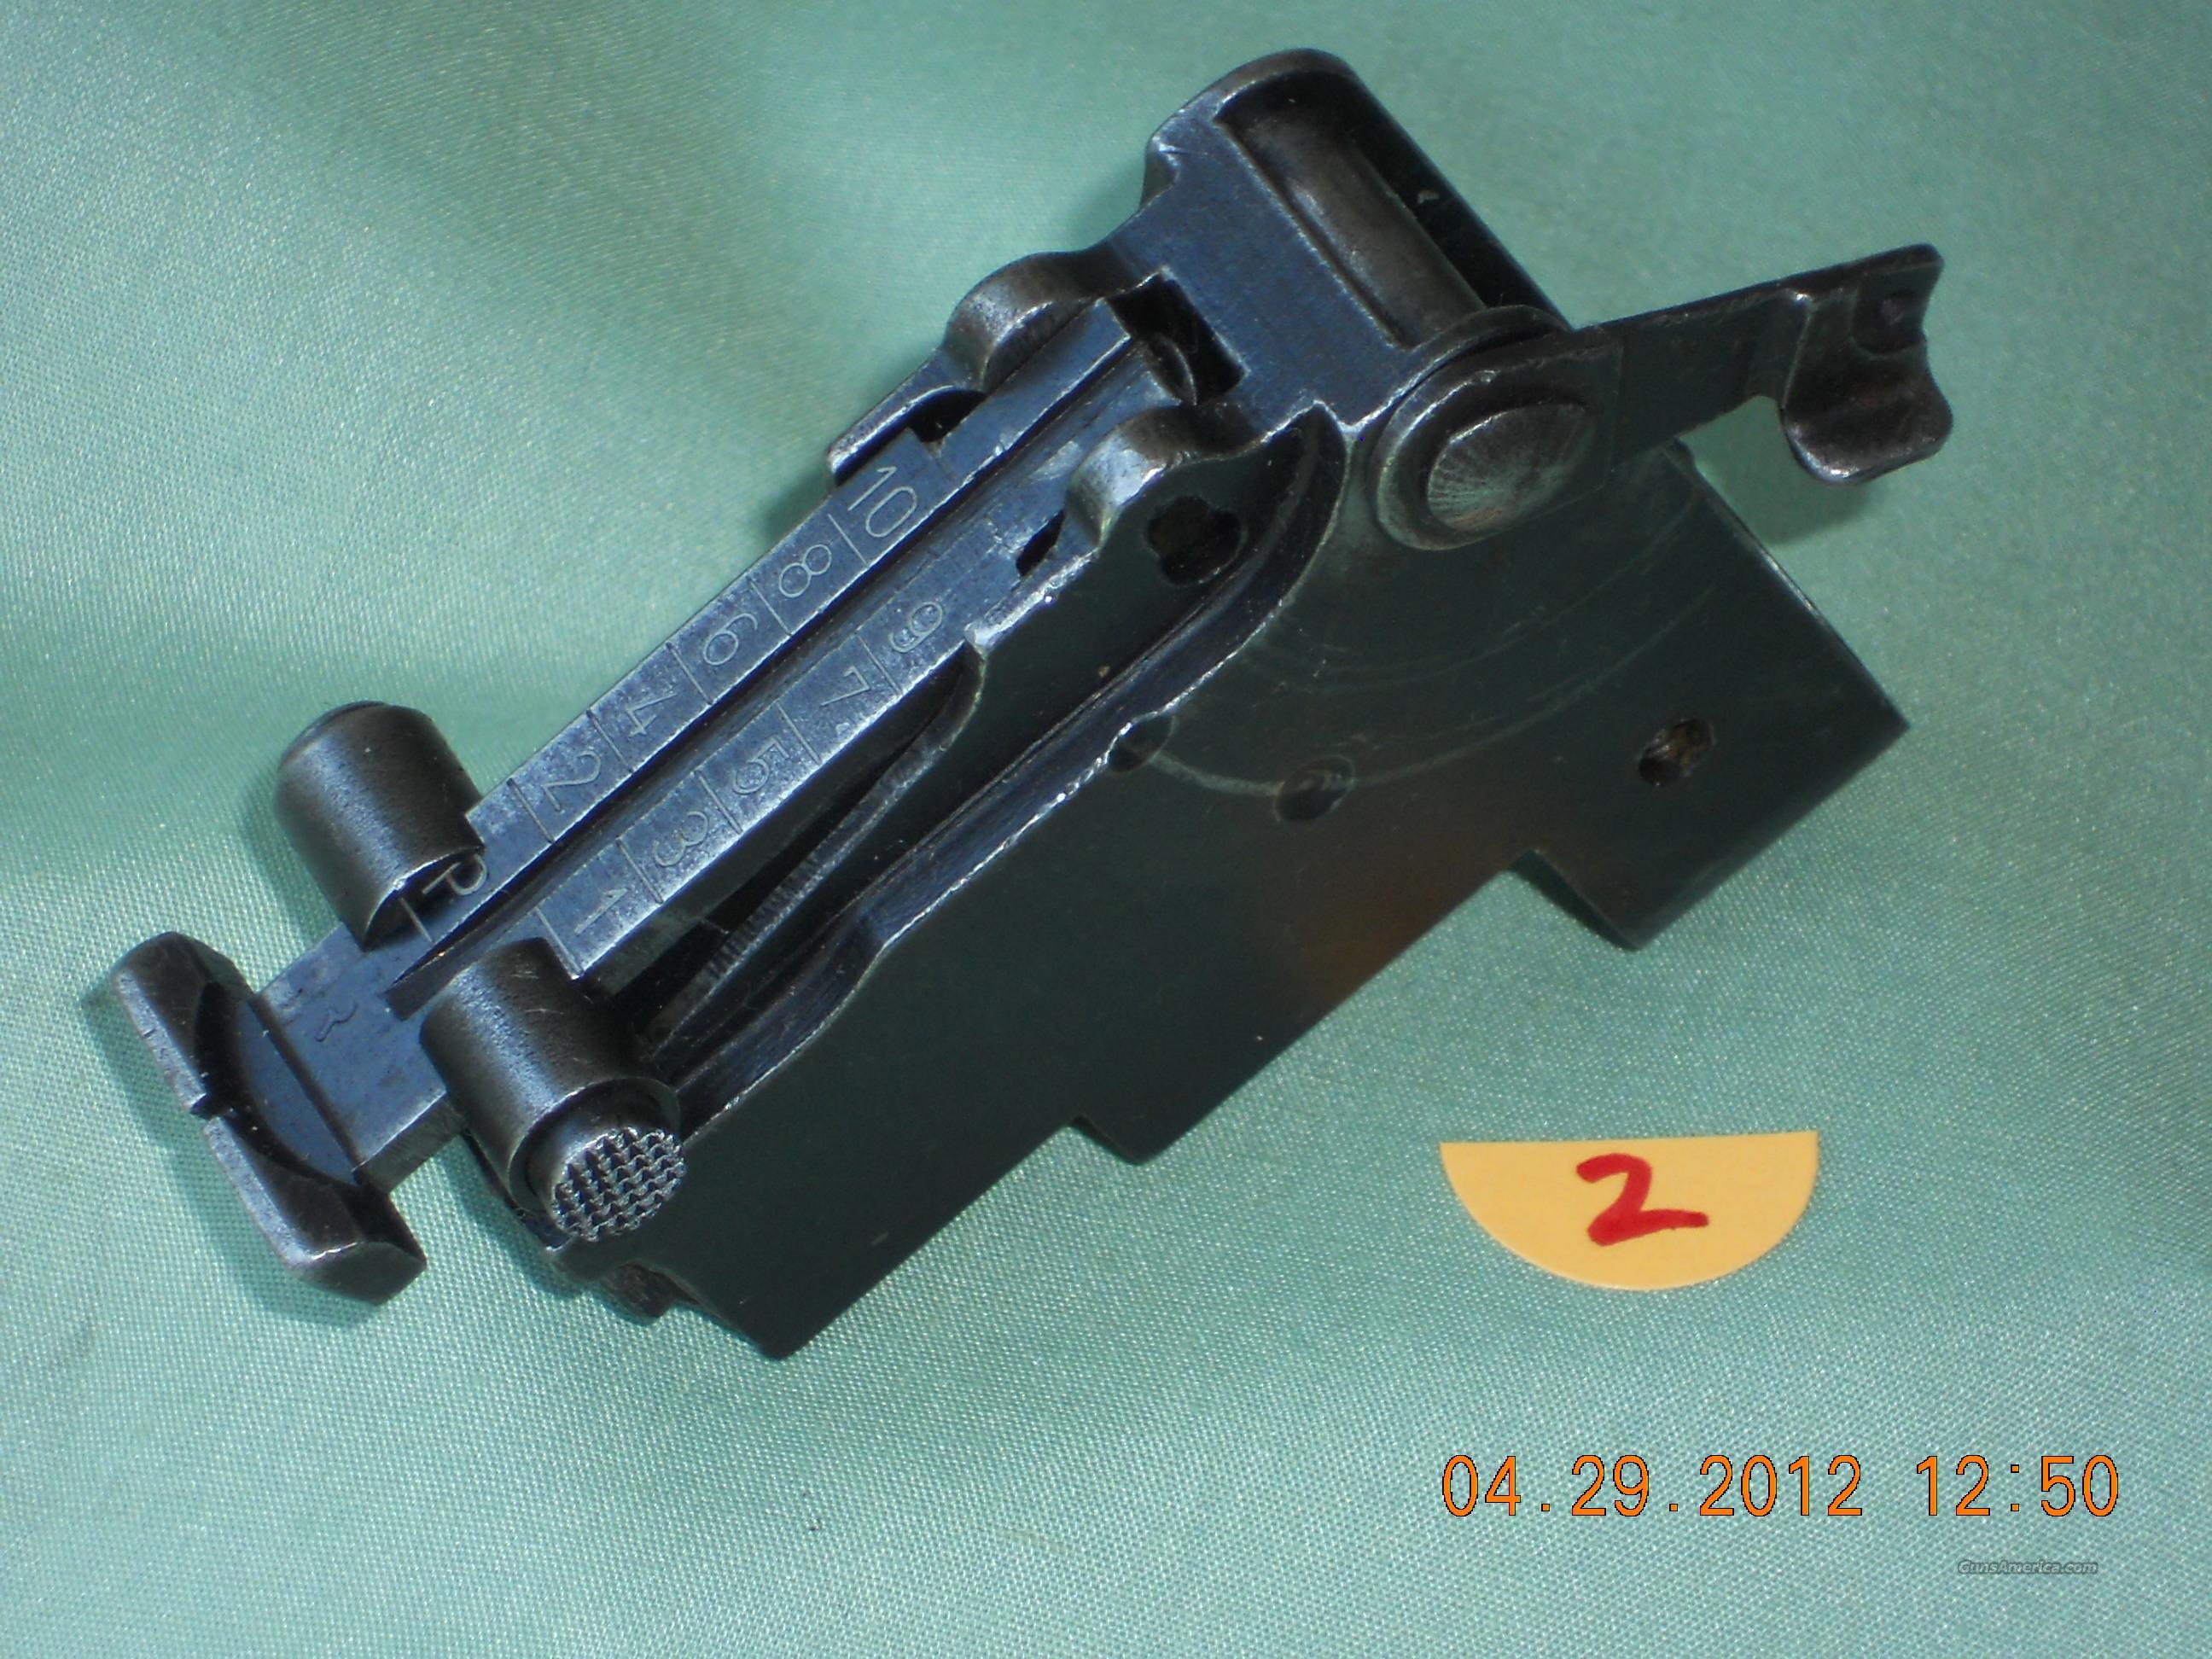 AK-47 ROMANIAN REAR SIGHT ASSEMBLY